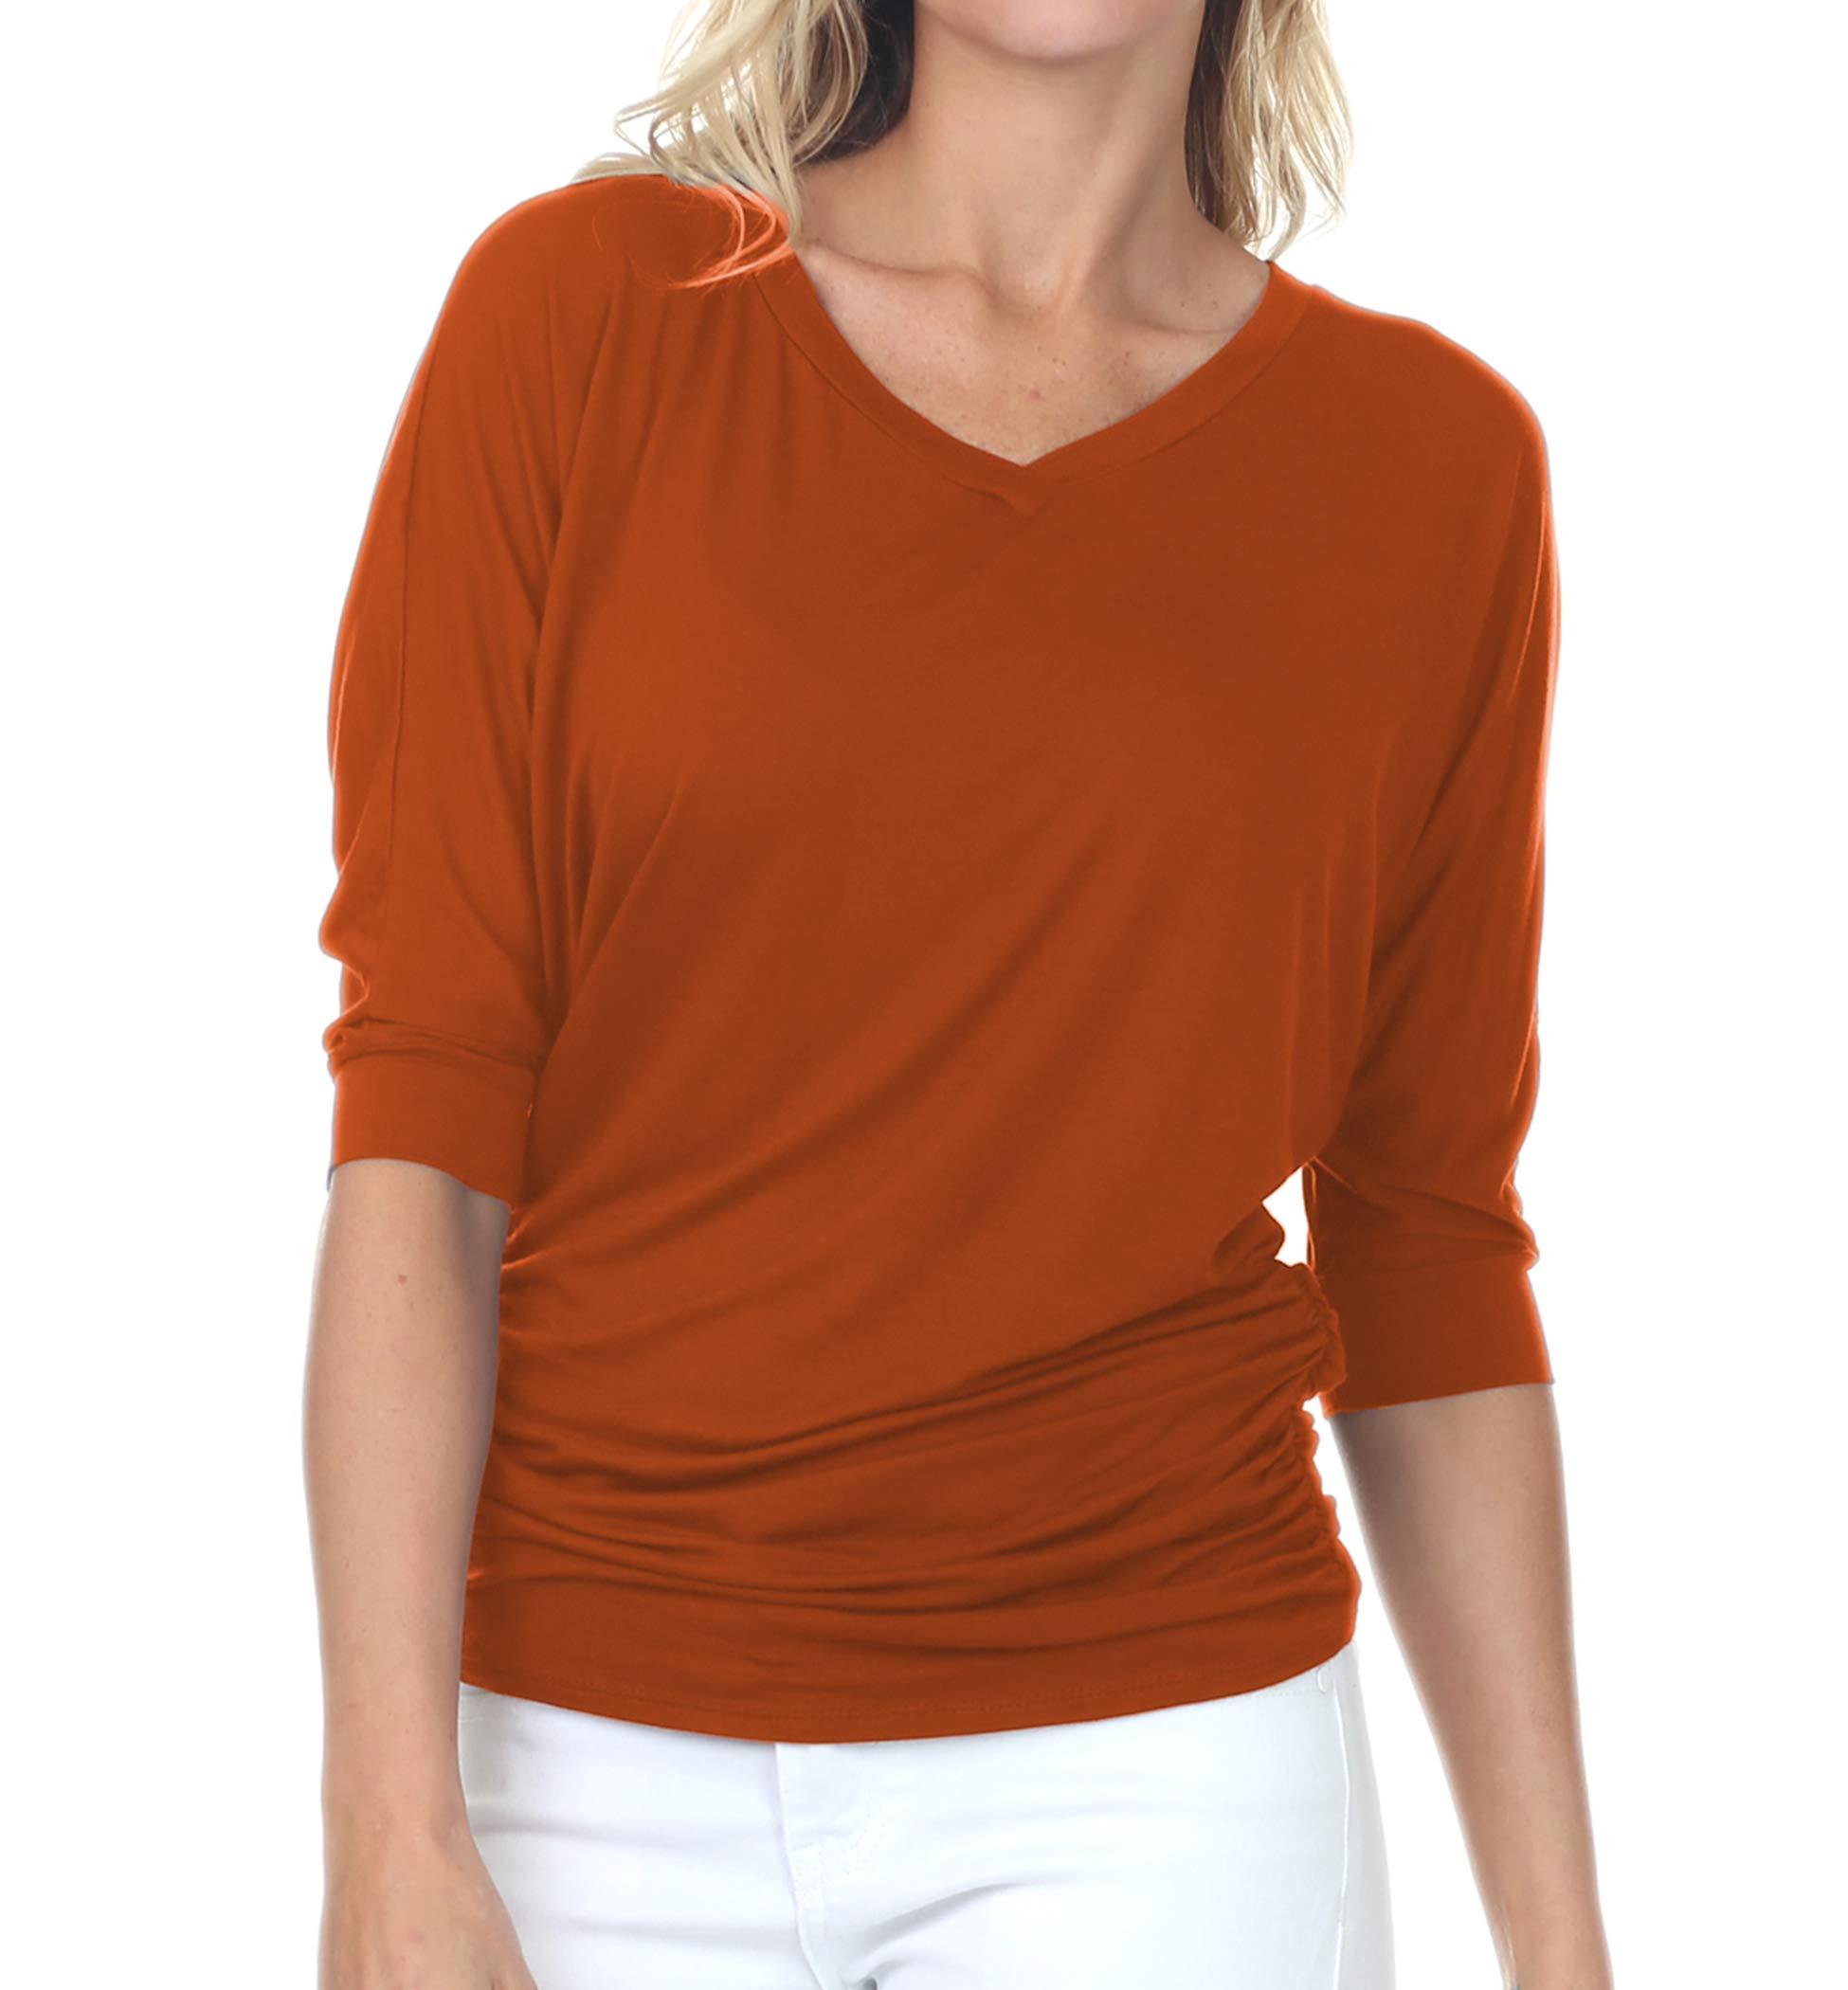 iliad USA Womens V-Neck/Boat Neck 3/4 Dolman Sleeve Side Shirring Drape Basic Top Regular & Plus Size